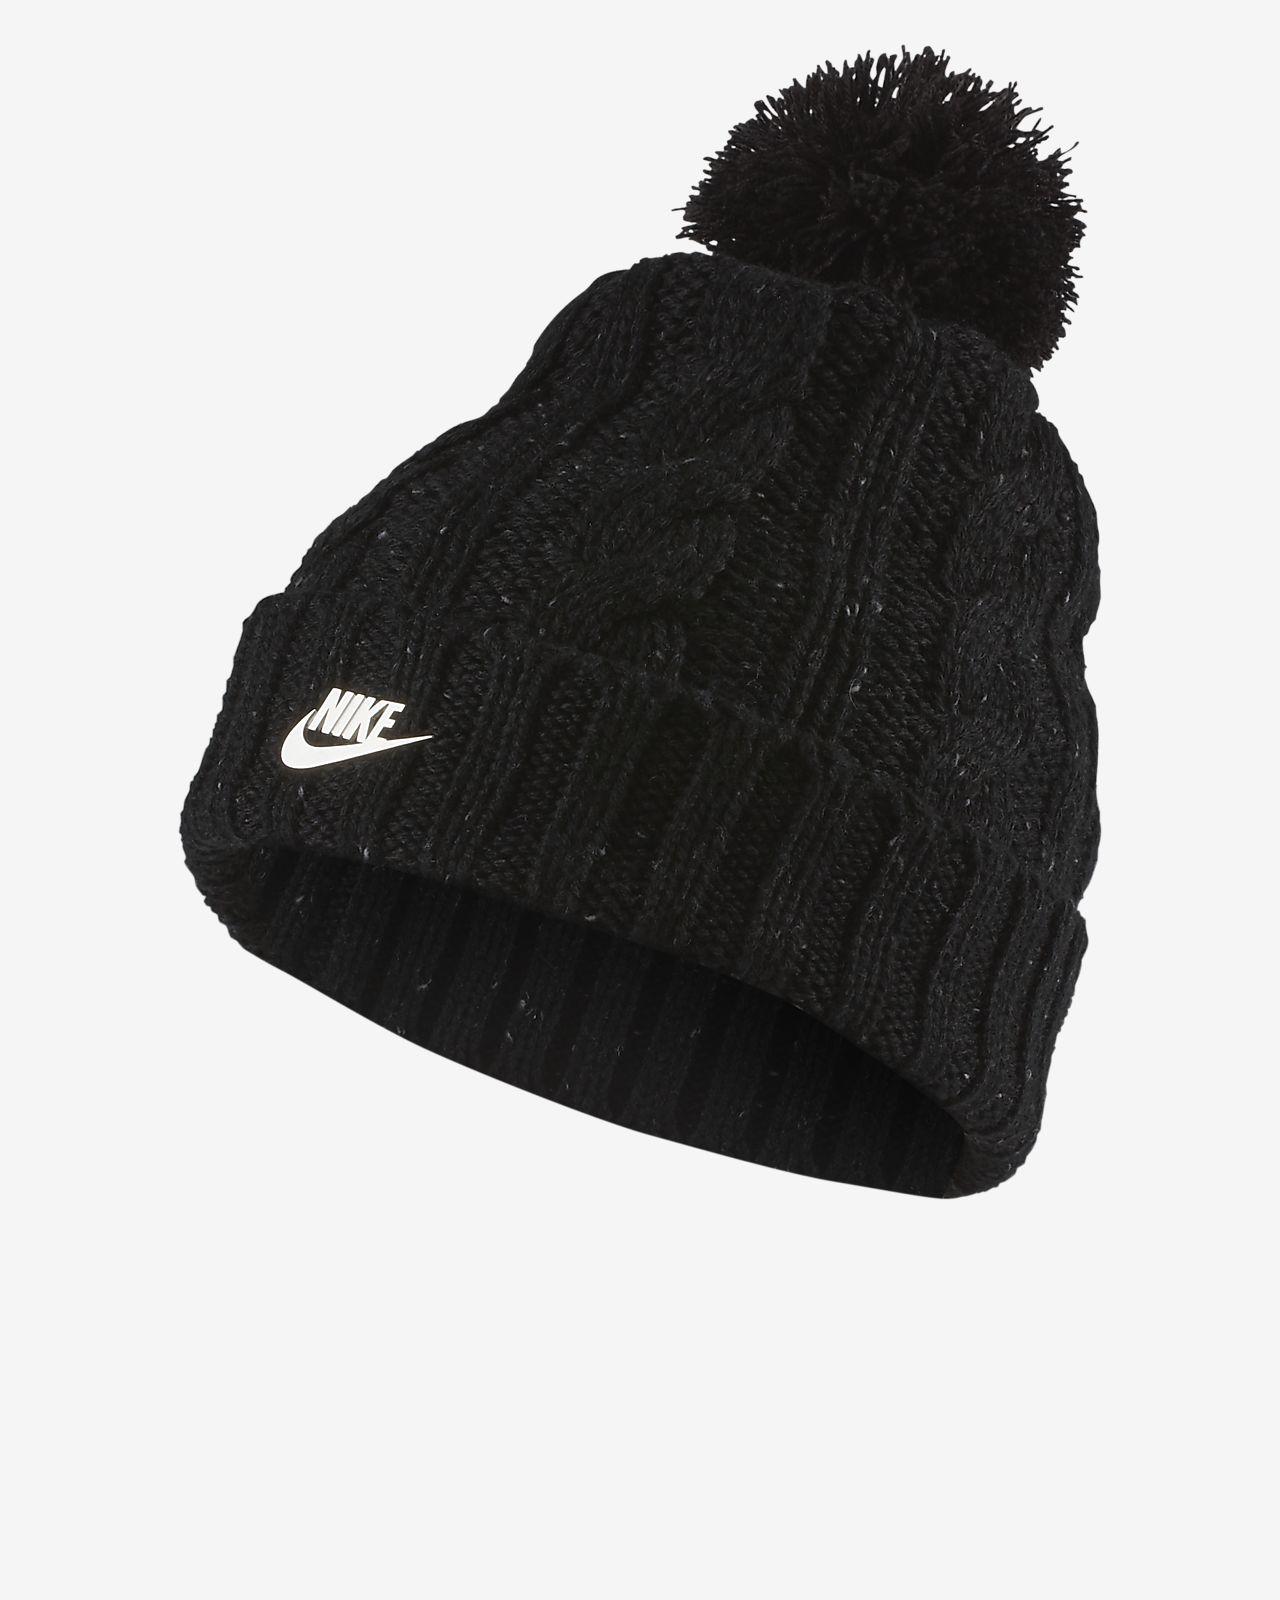 online store 78549 6f397 ... ireland nike sportswear beanie e8d4c c1d67